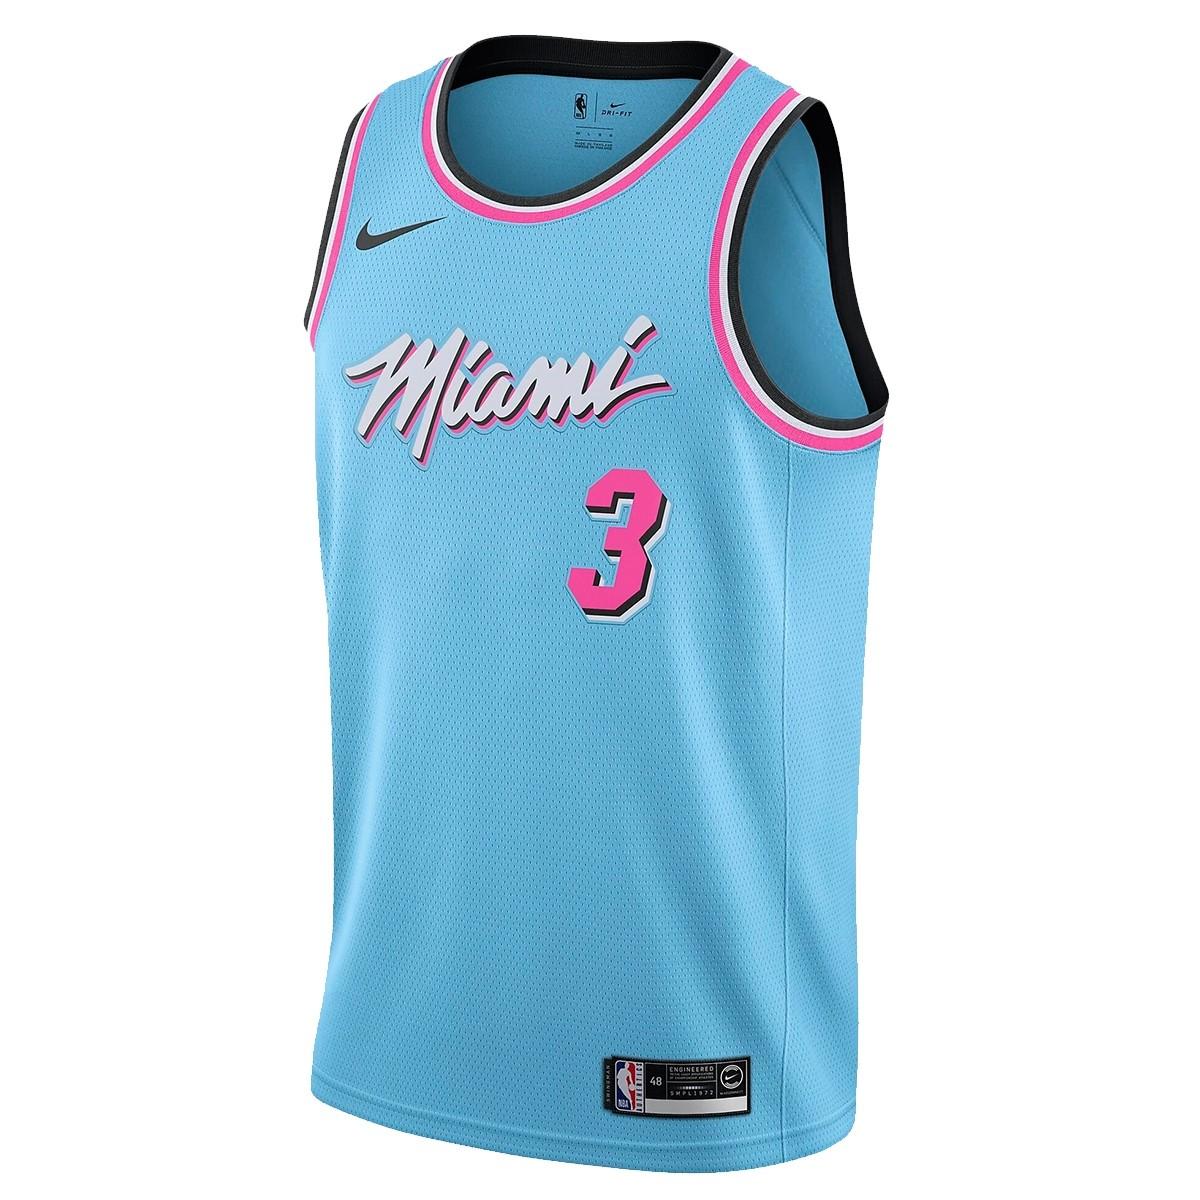 Nike Junior NBA Miami Swingman Jersey Wade 'City Edition'